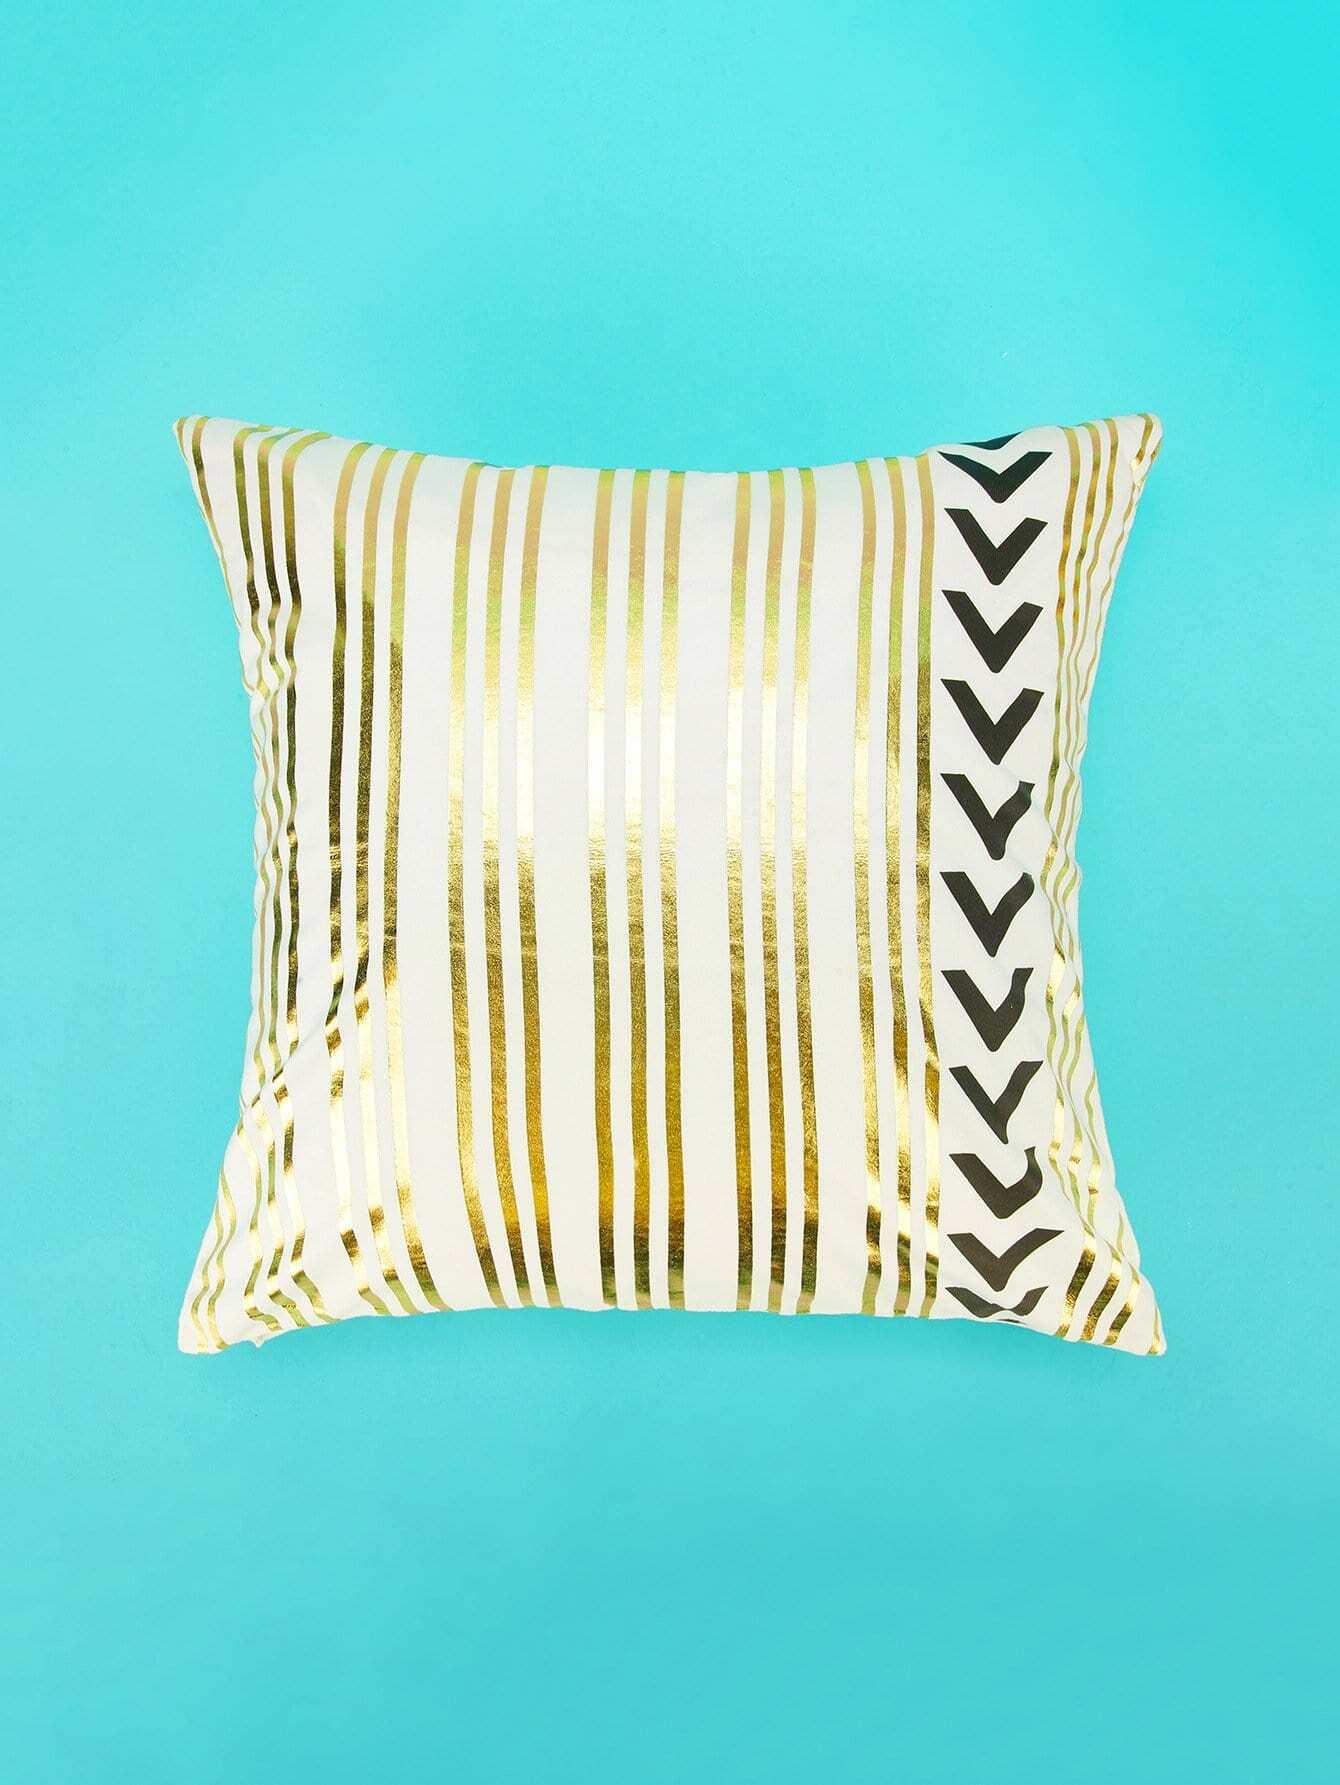 Striped Print Pillowcase Cover 1PC